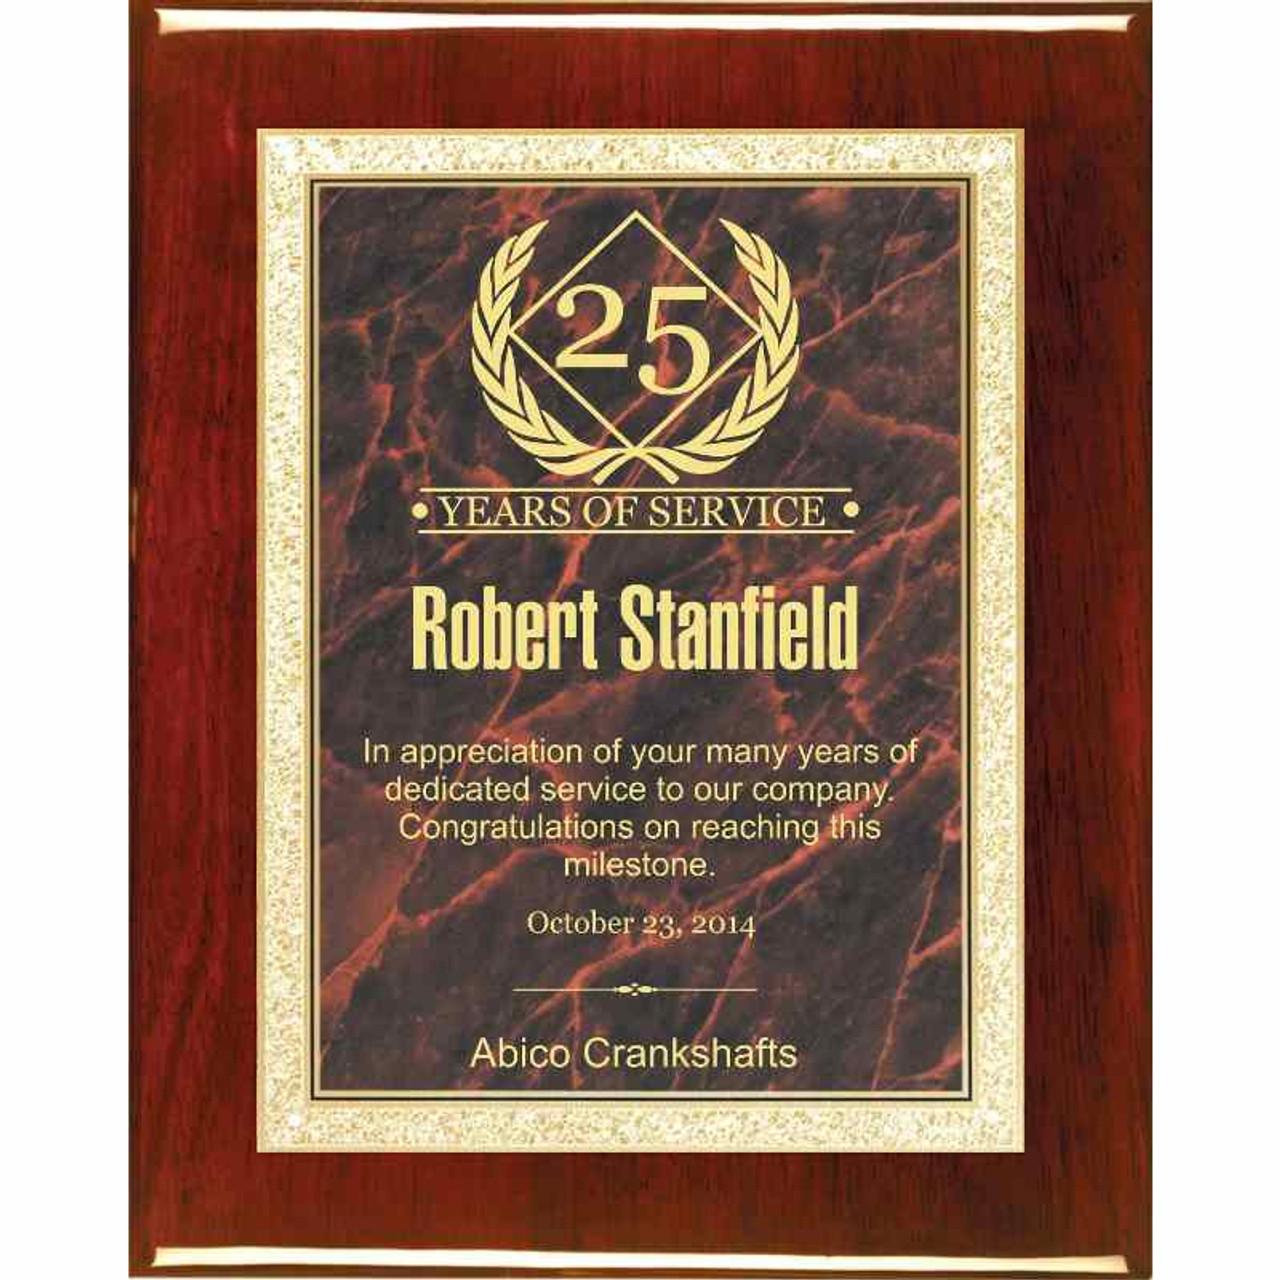 YMCA Award Plaque 6x8 Trophy FREE engraving